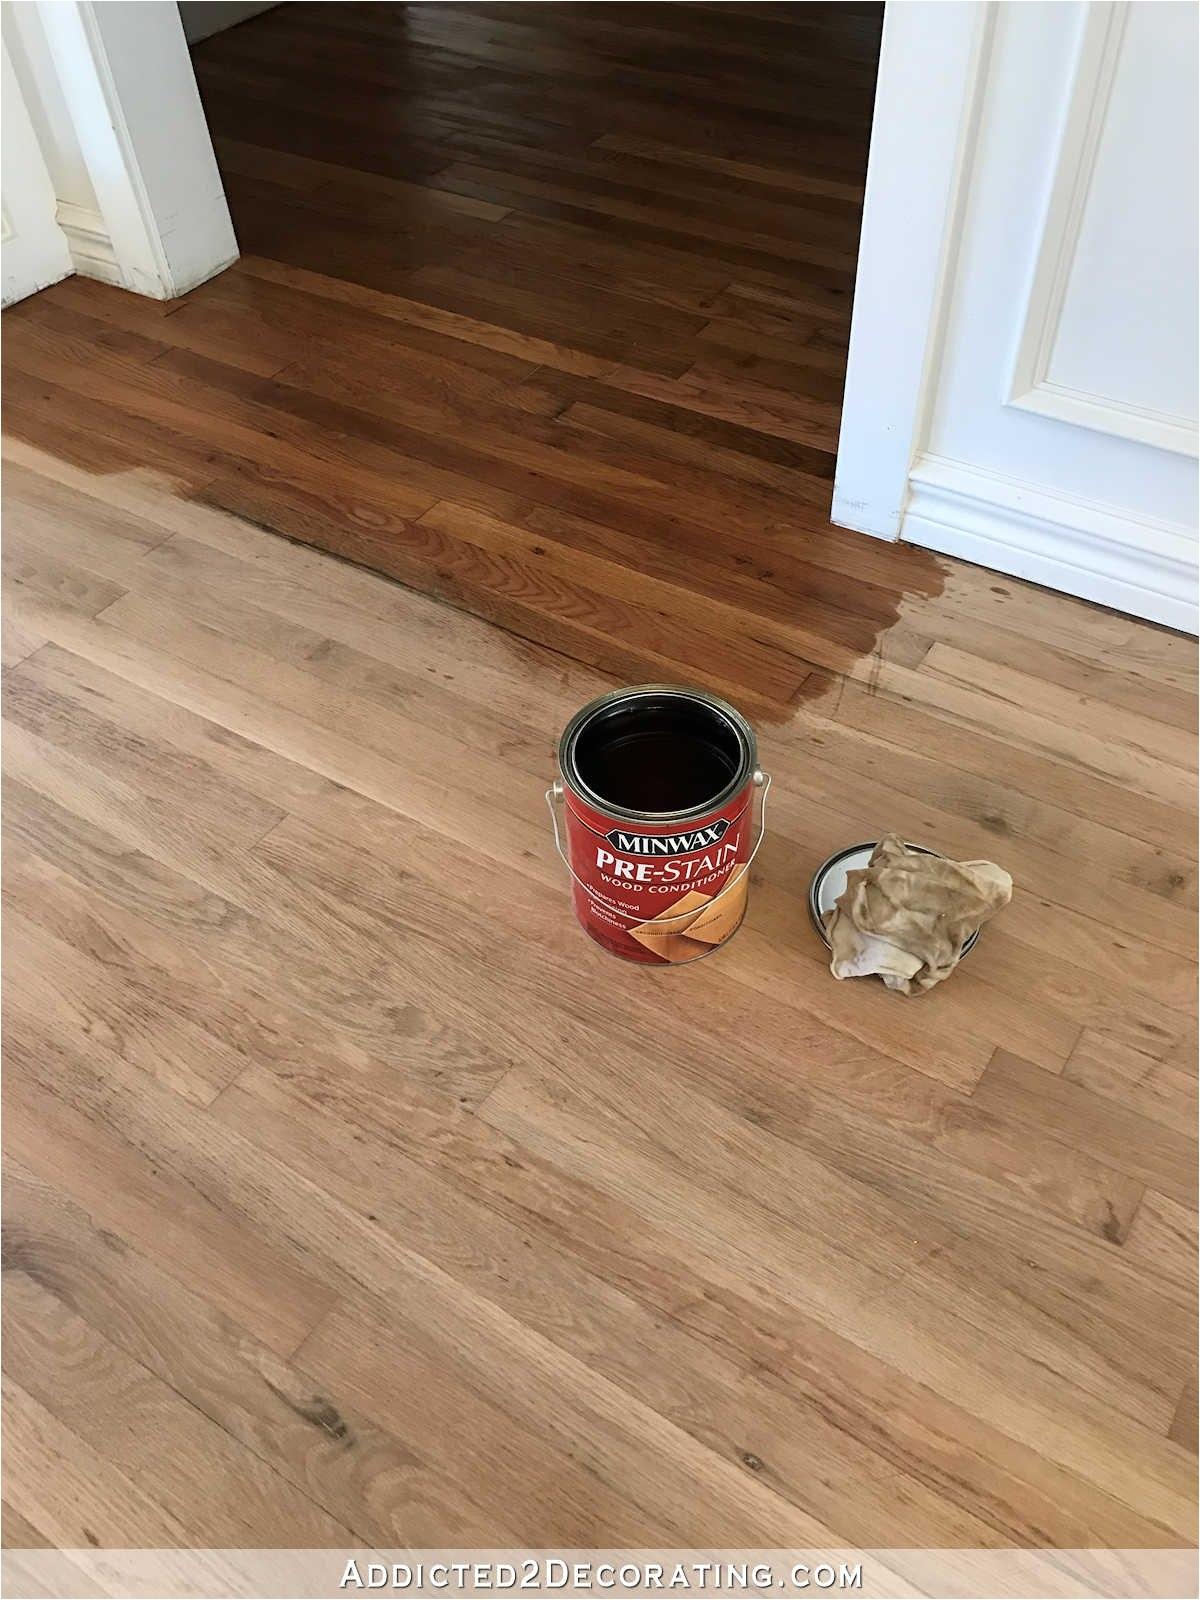 Dog Pee Stain On Wood Floor Urine Smell Hardwood Floor Podemosleganes